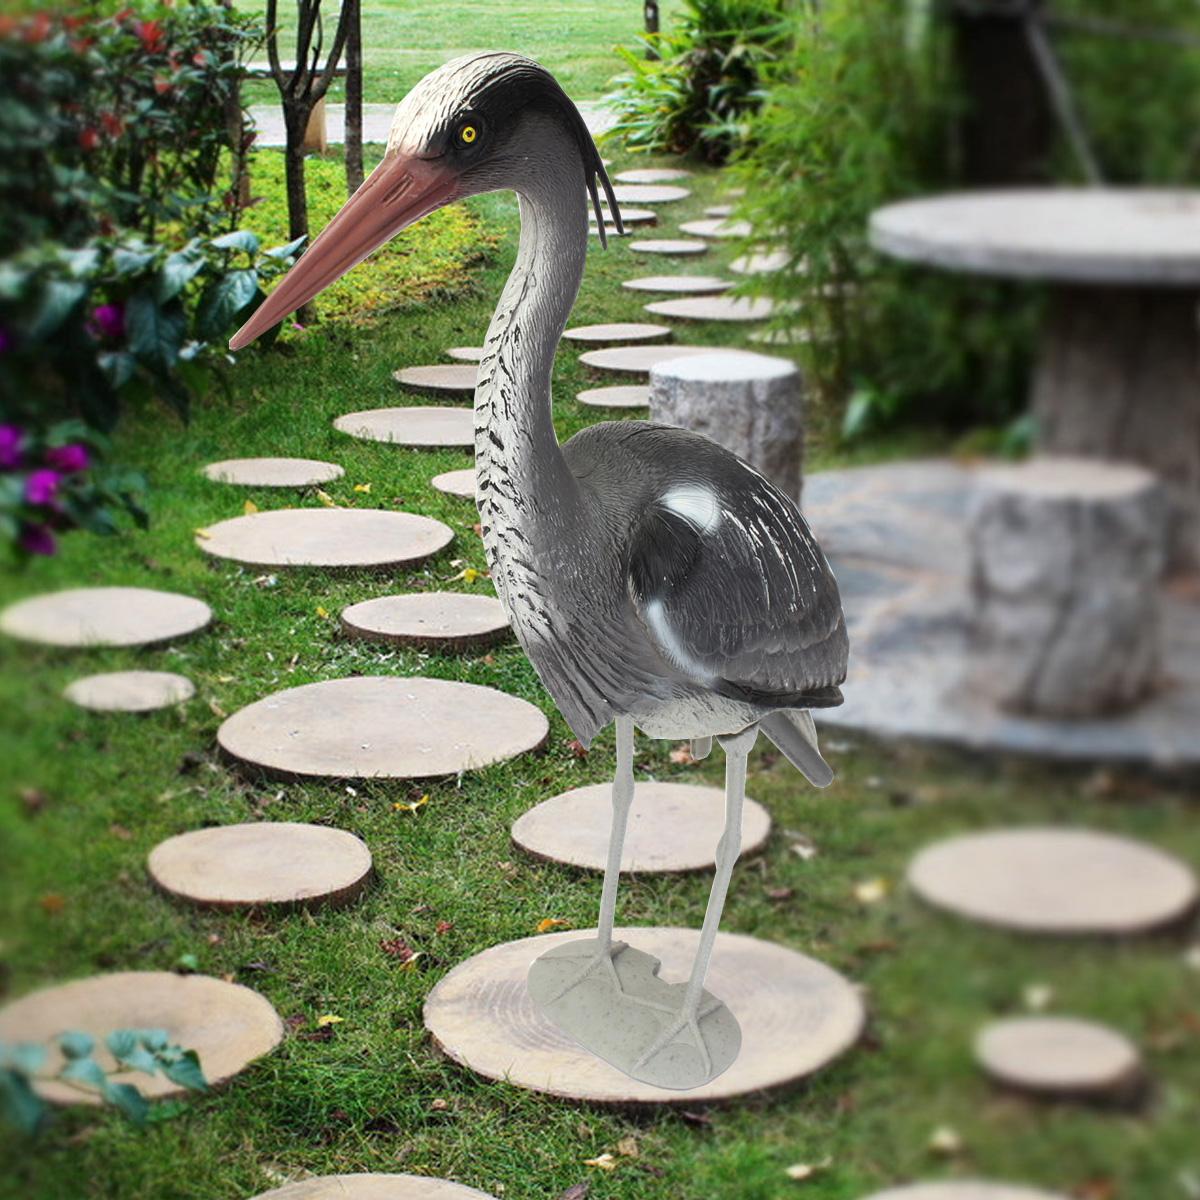 Heron garden ornament - Detail Image